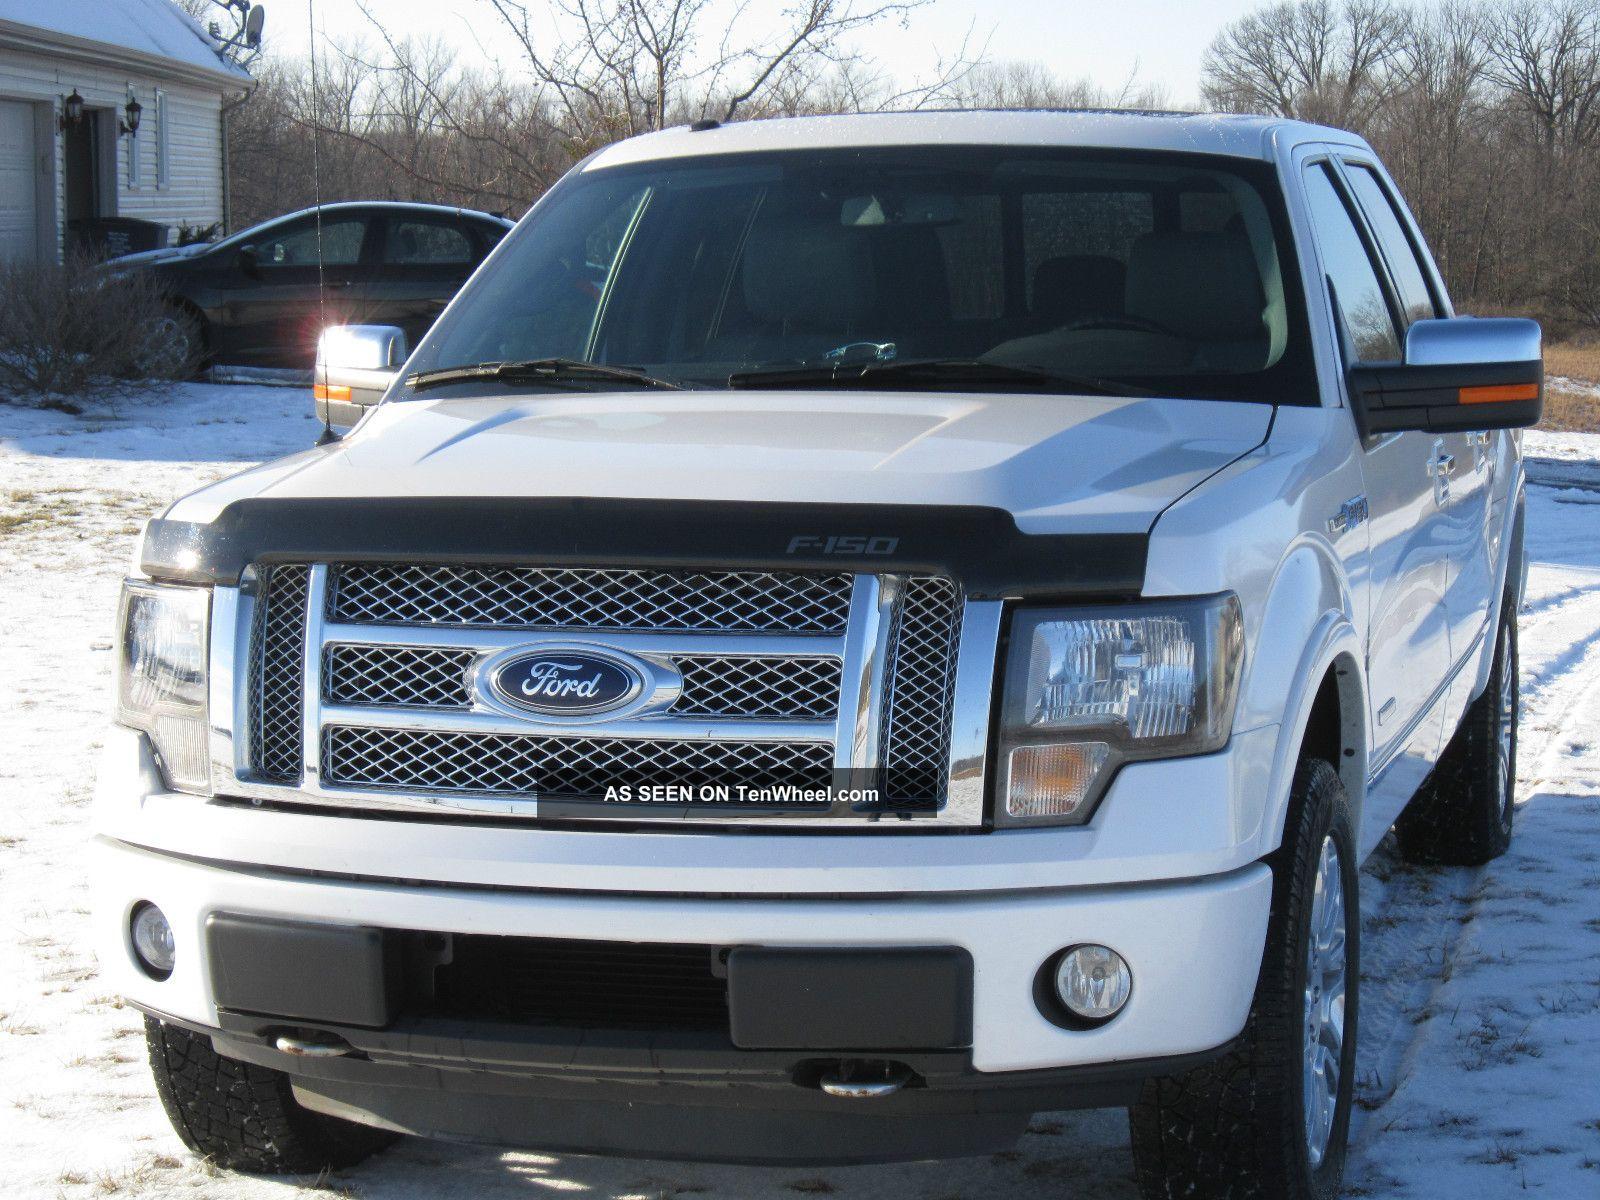 2012 ford f 150 ecoboost platinum crew cab 4x4 crew truck turbo 3 5l. Black Bedroom Furniture Sets. Home Design Ideas